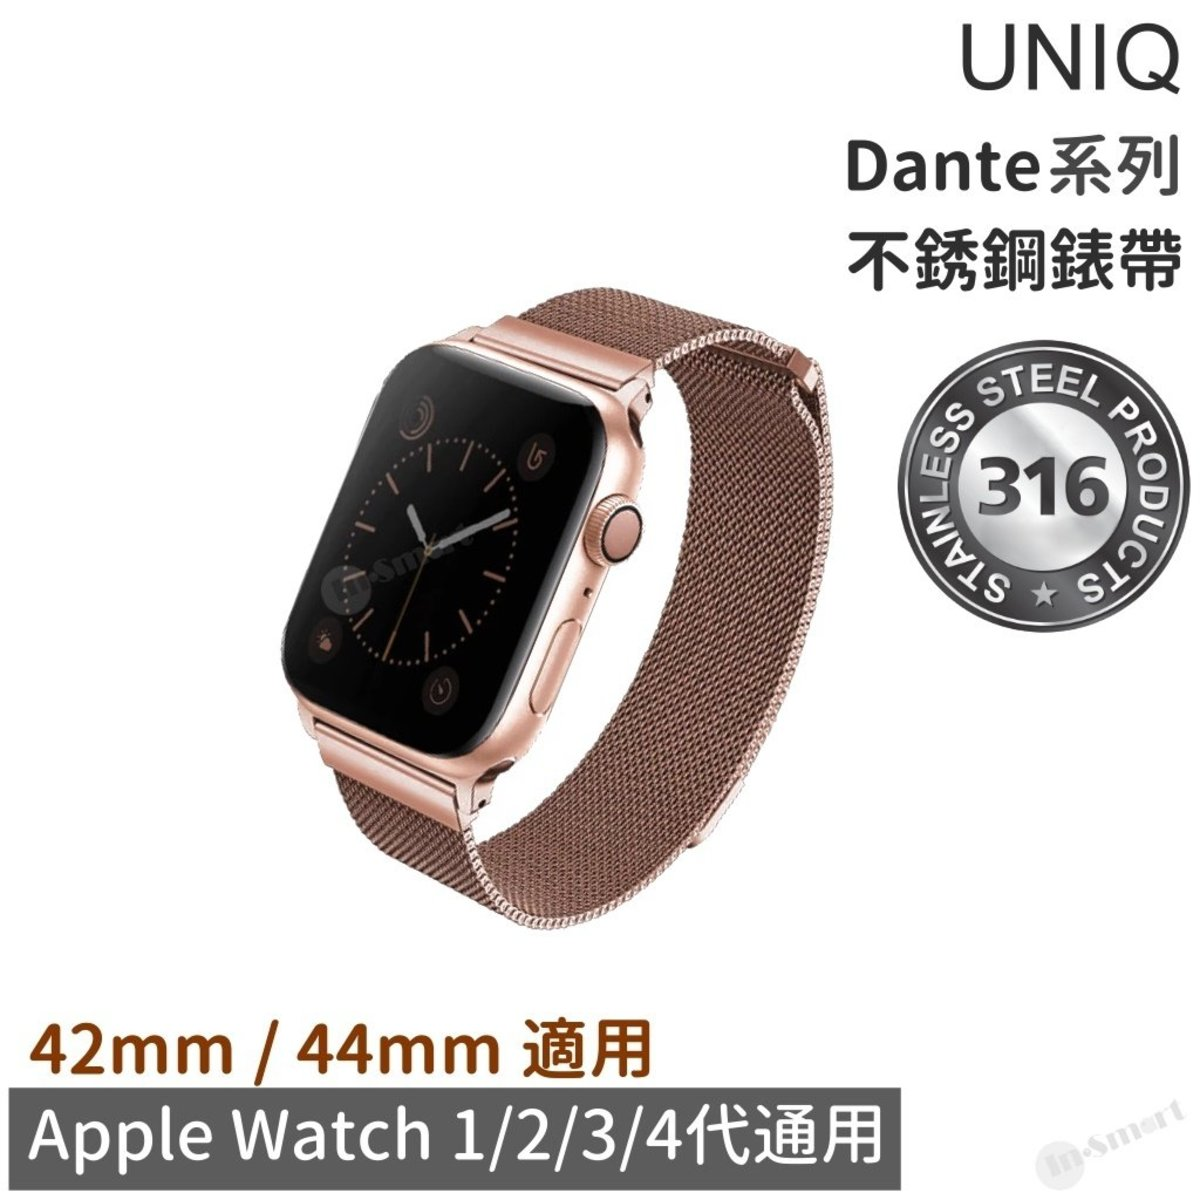 Apple Watch 鋼織手環錶帶 42mm/44mm - Dante 系列 (金色)